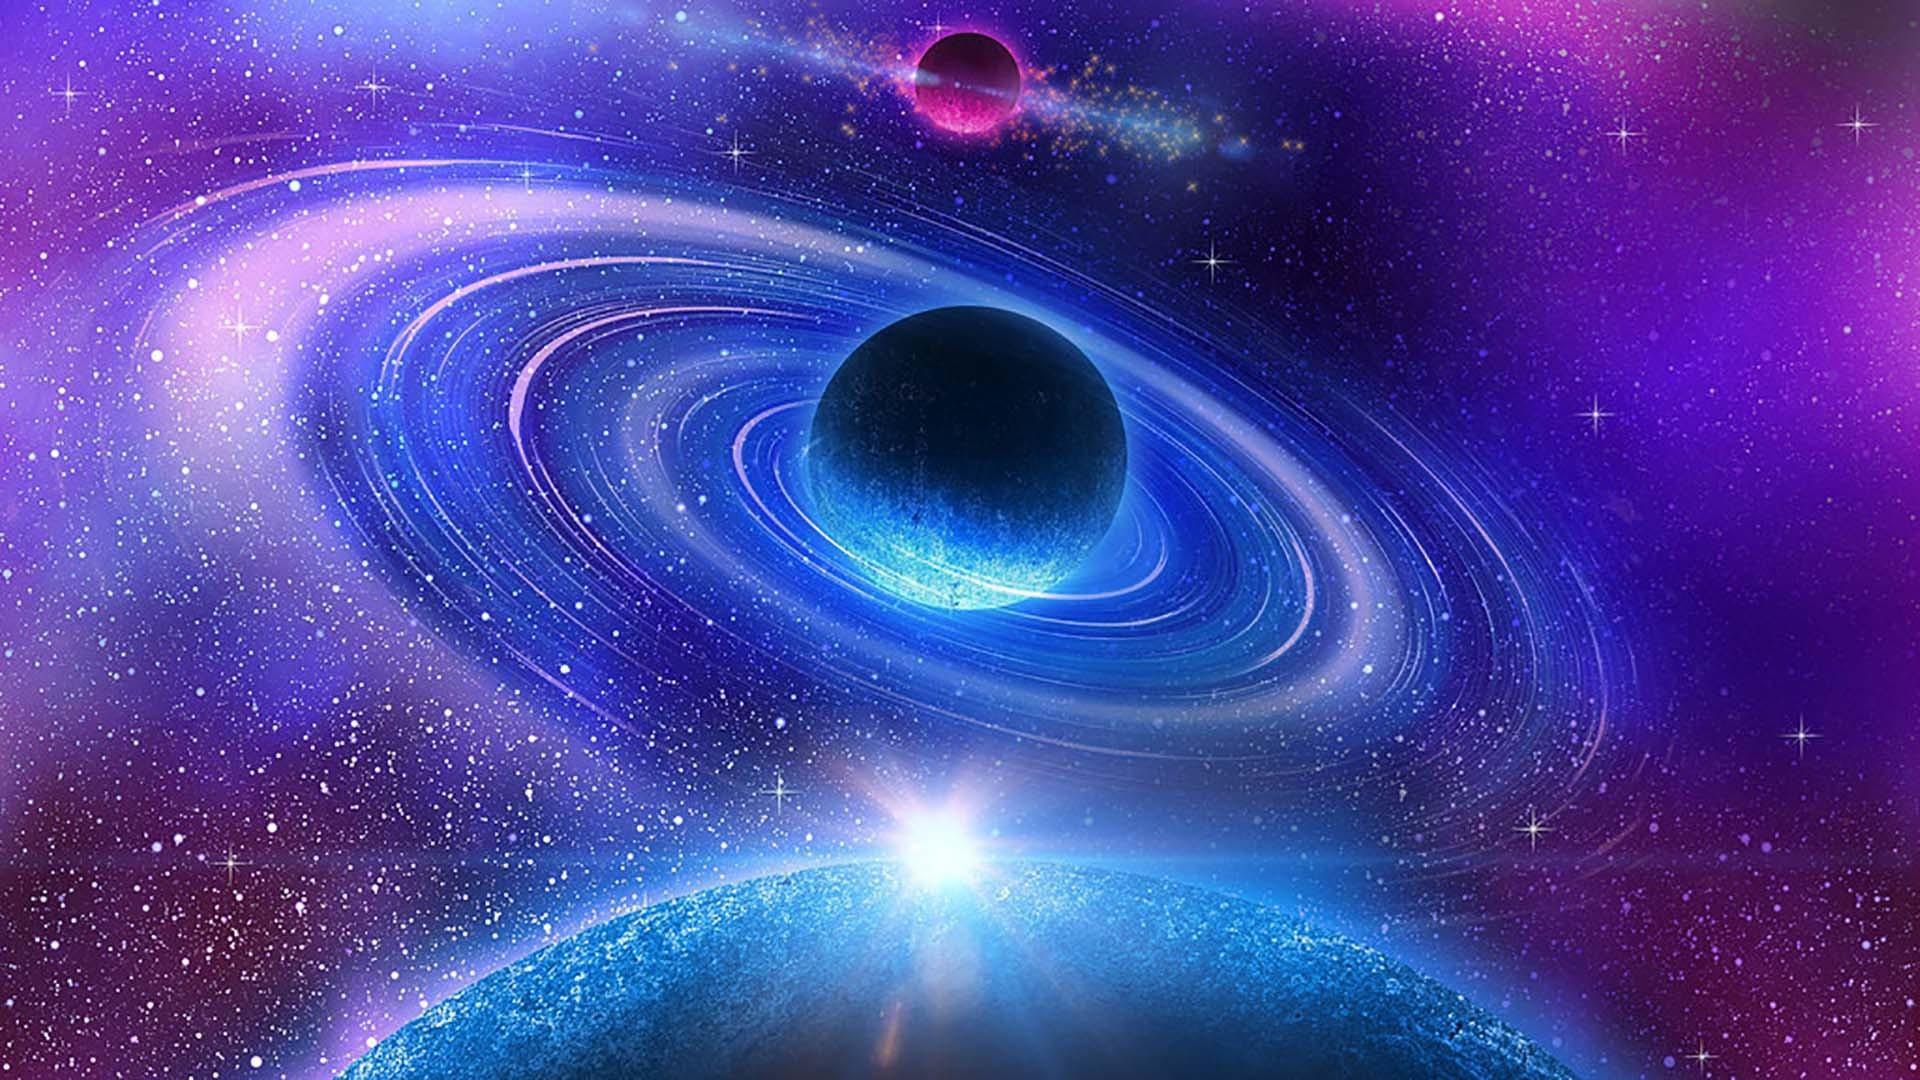 cool galaxy wallpapers · galaxy wallpaper · cool HD wallpaper · cute and cool  wallpapers